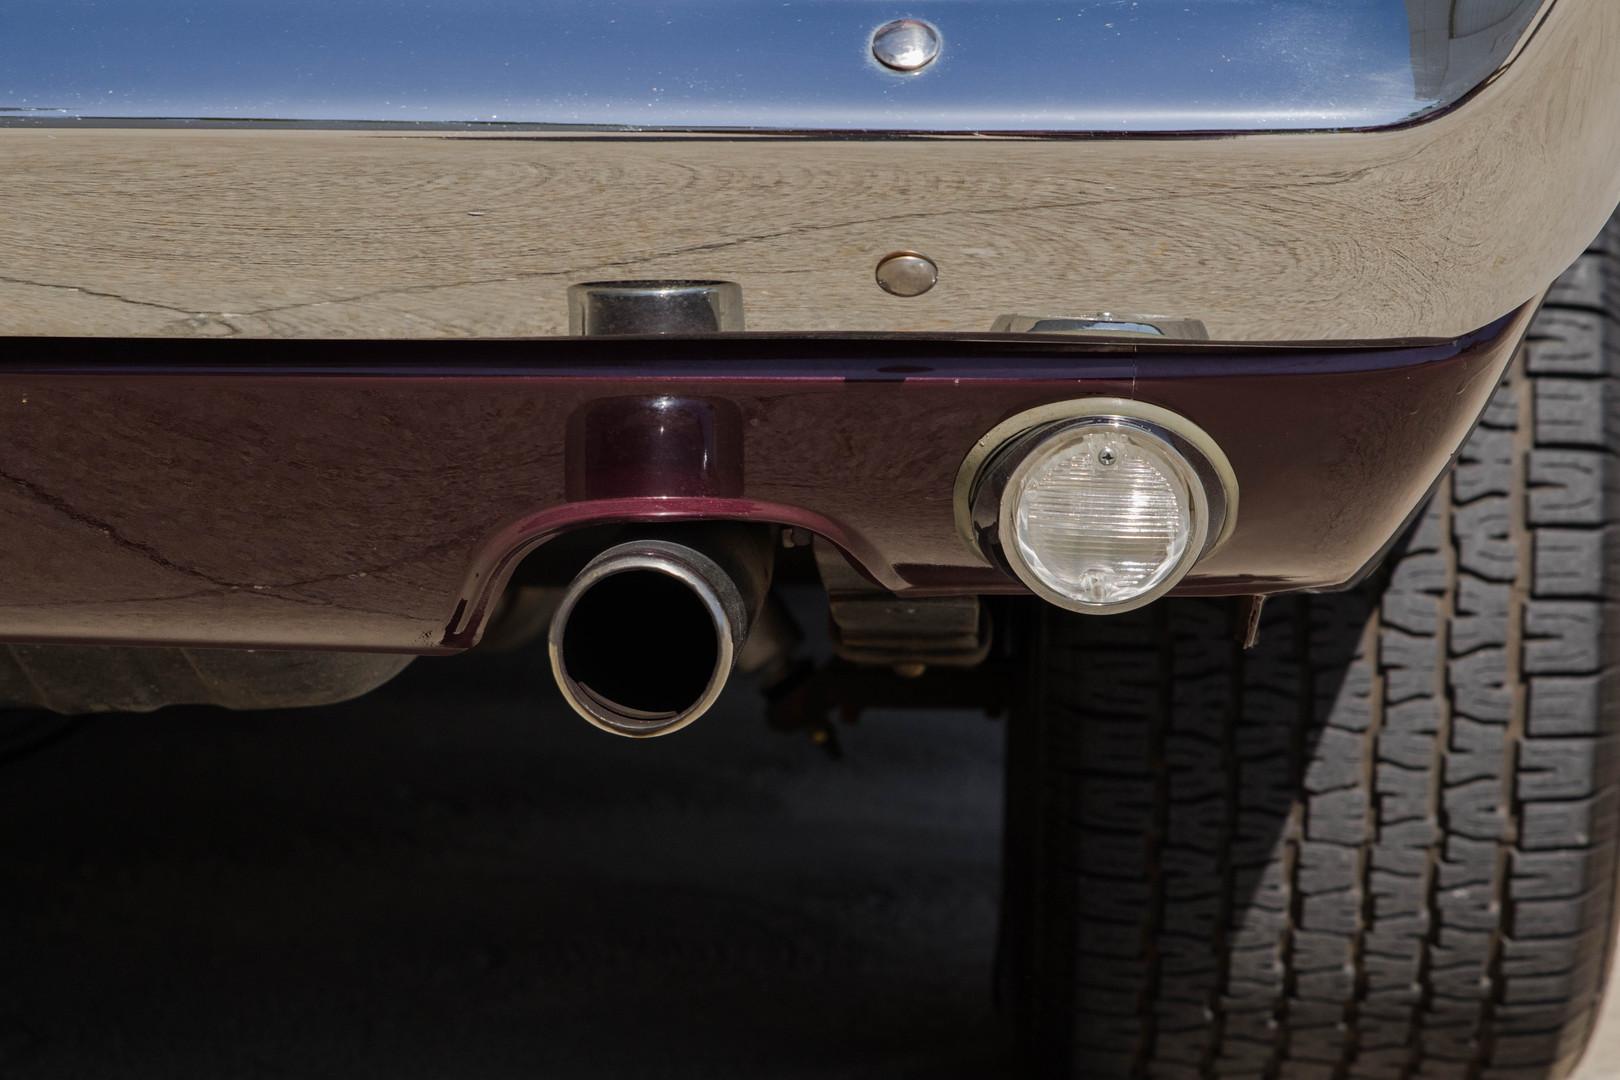 Ford Fmx Transmission Repair Wiring Diagram